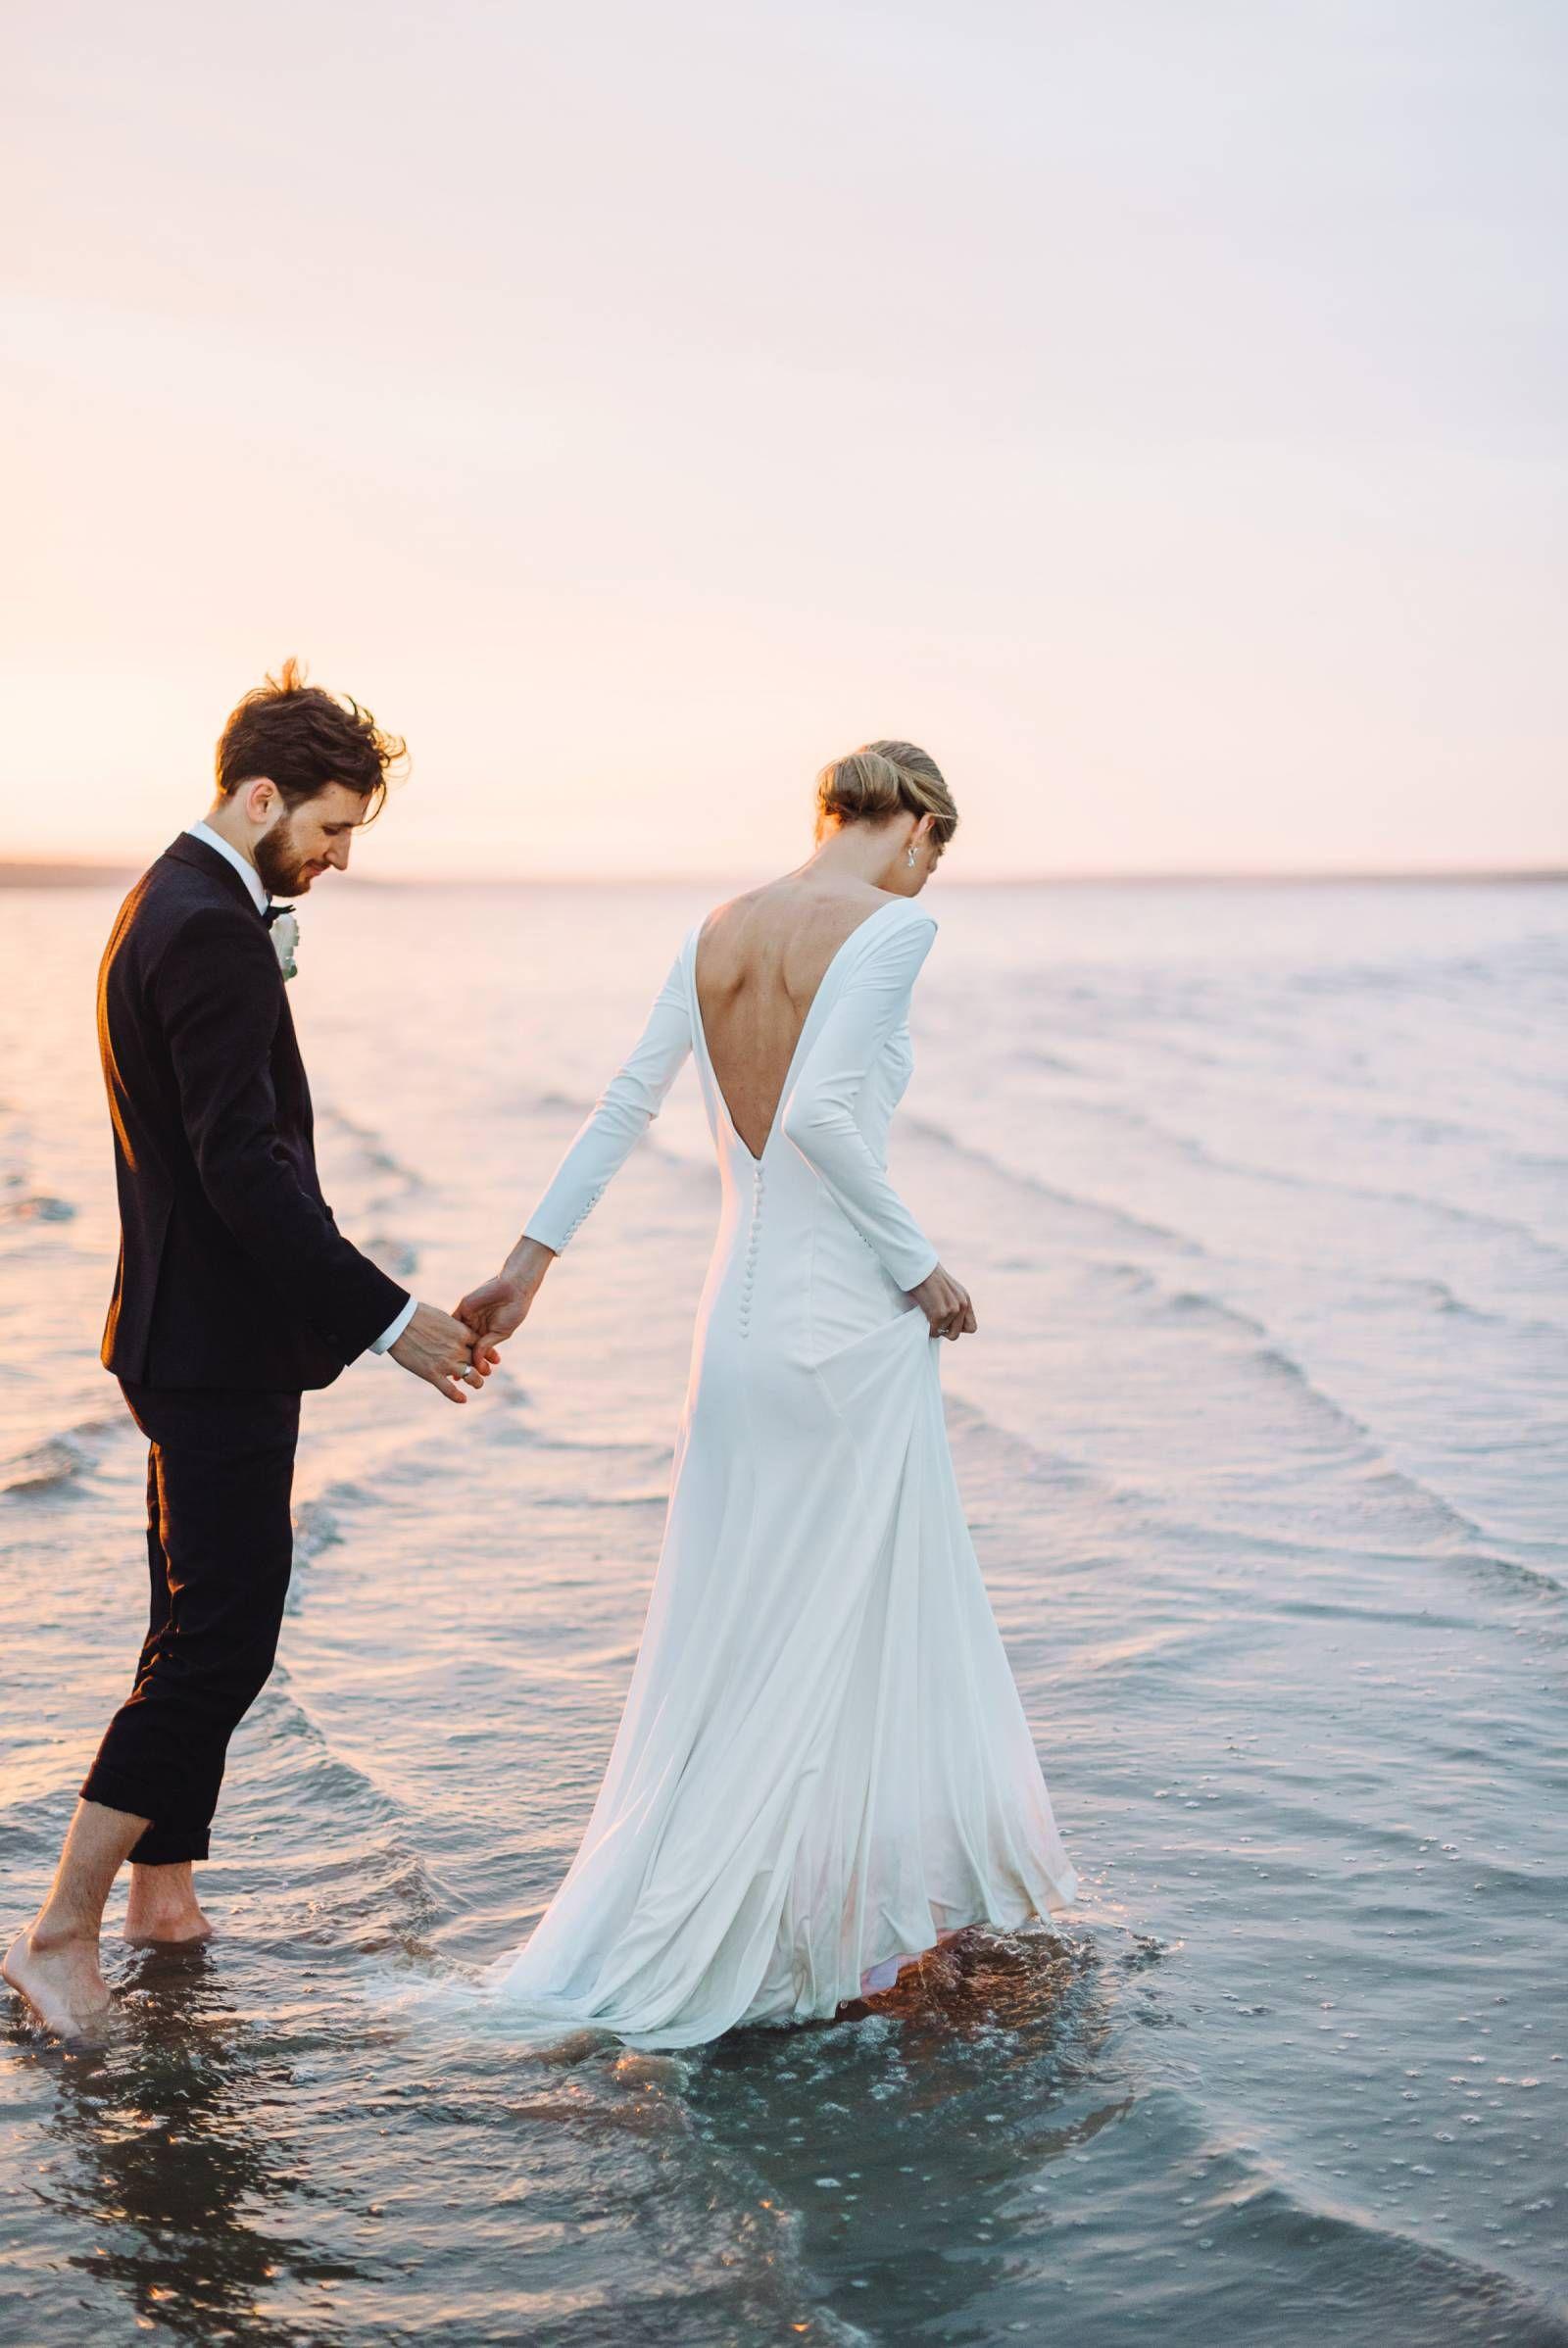 Weddingdress Beachwedding Wedding Call Me Madame A French